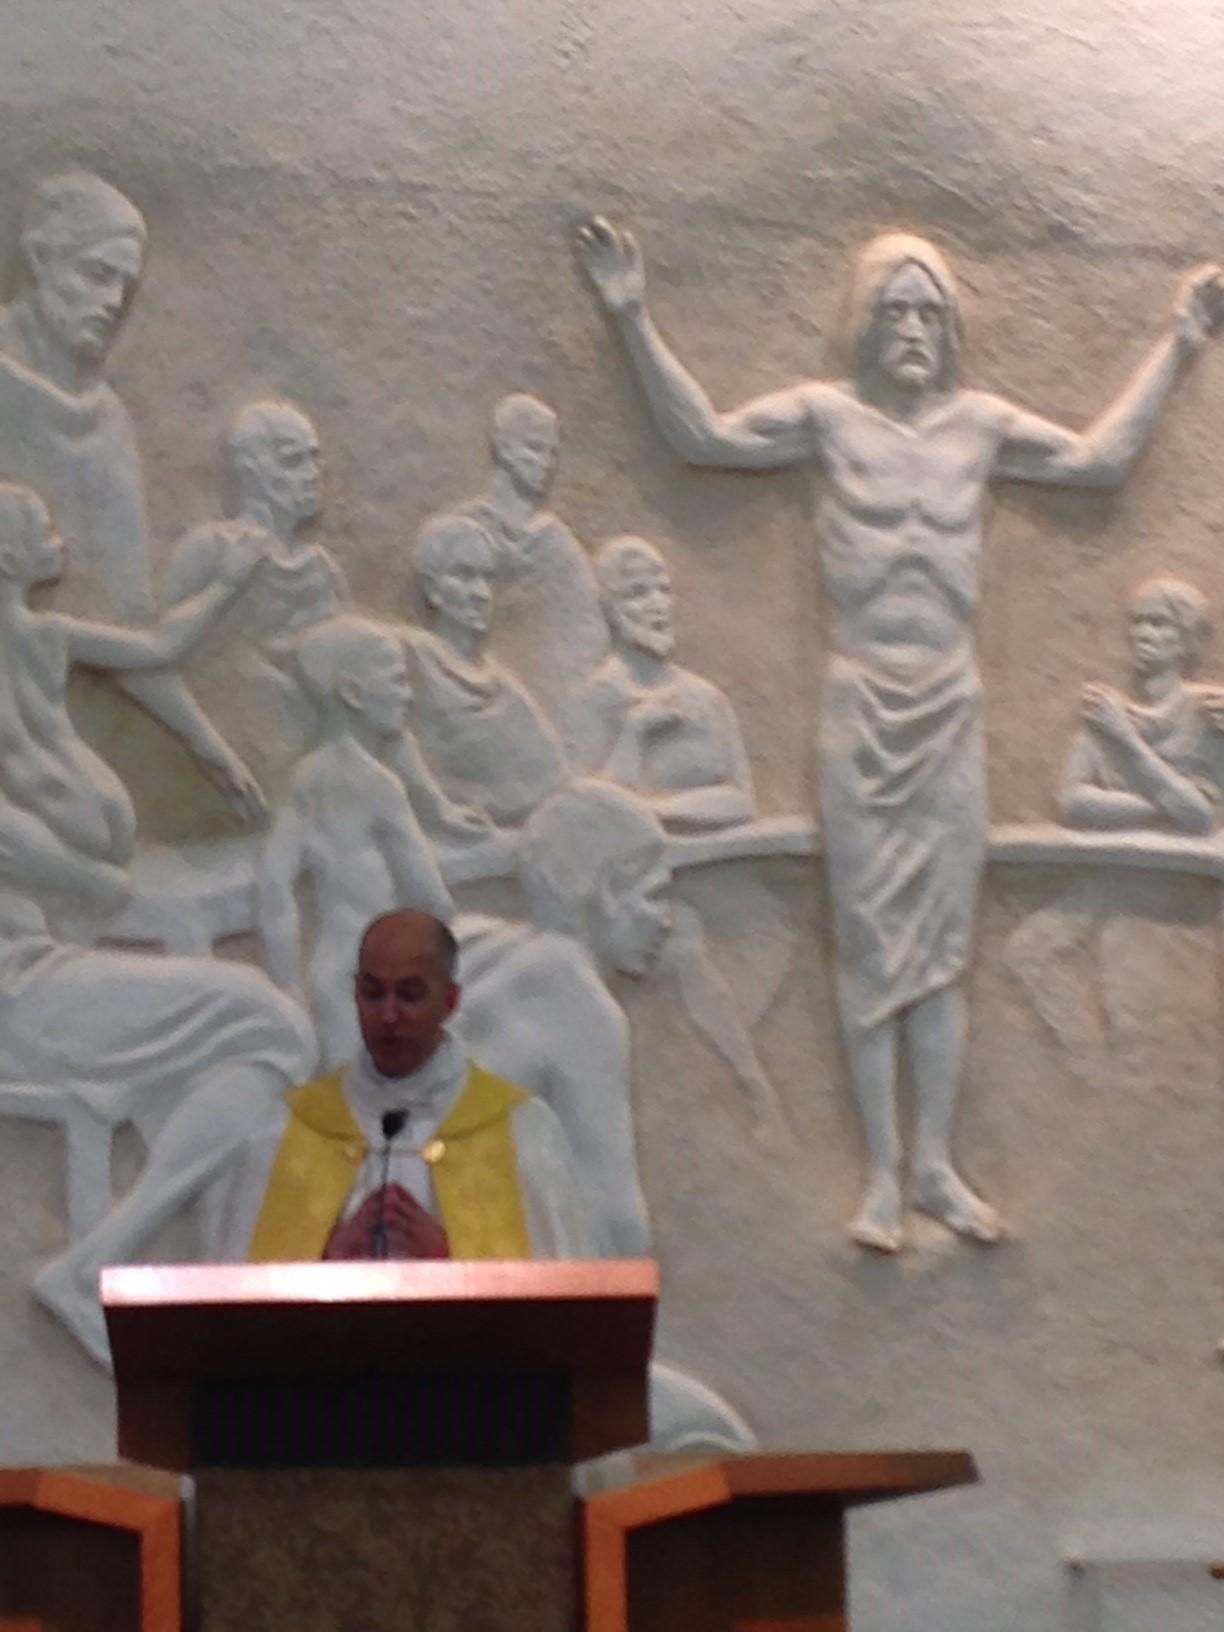 Priest speaking in front of mural